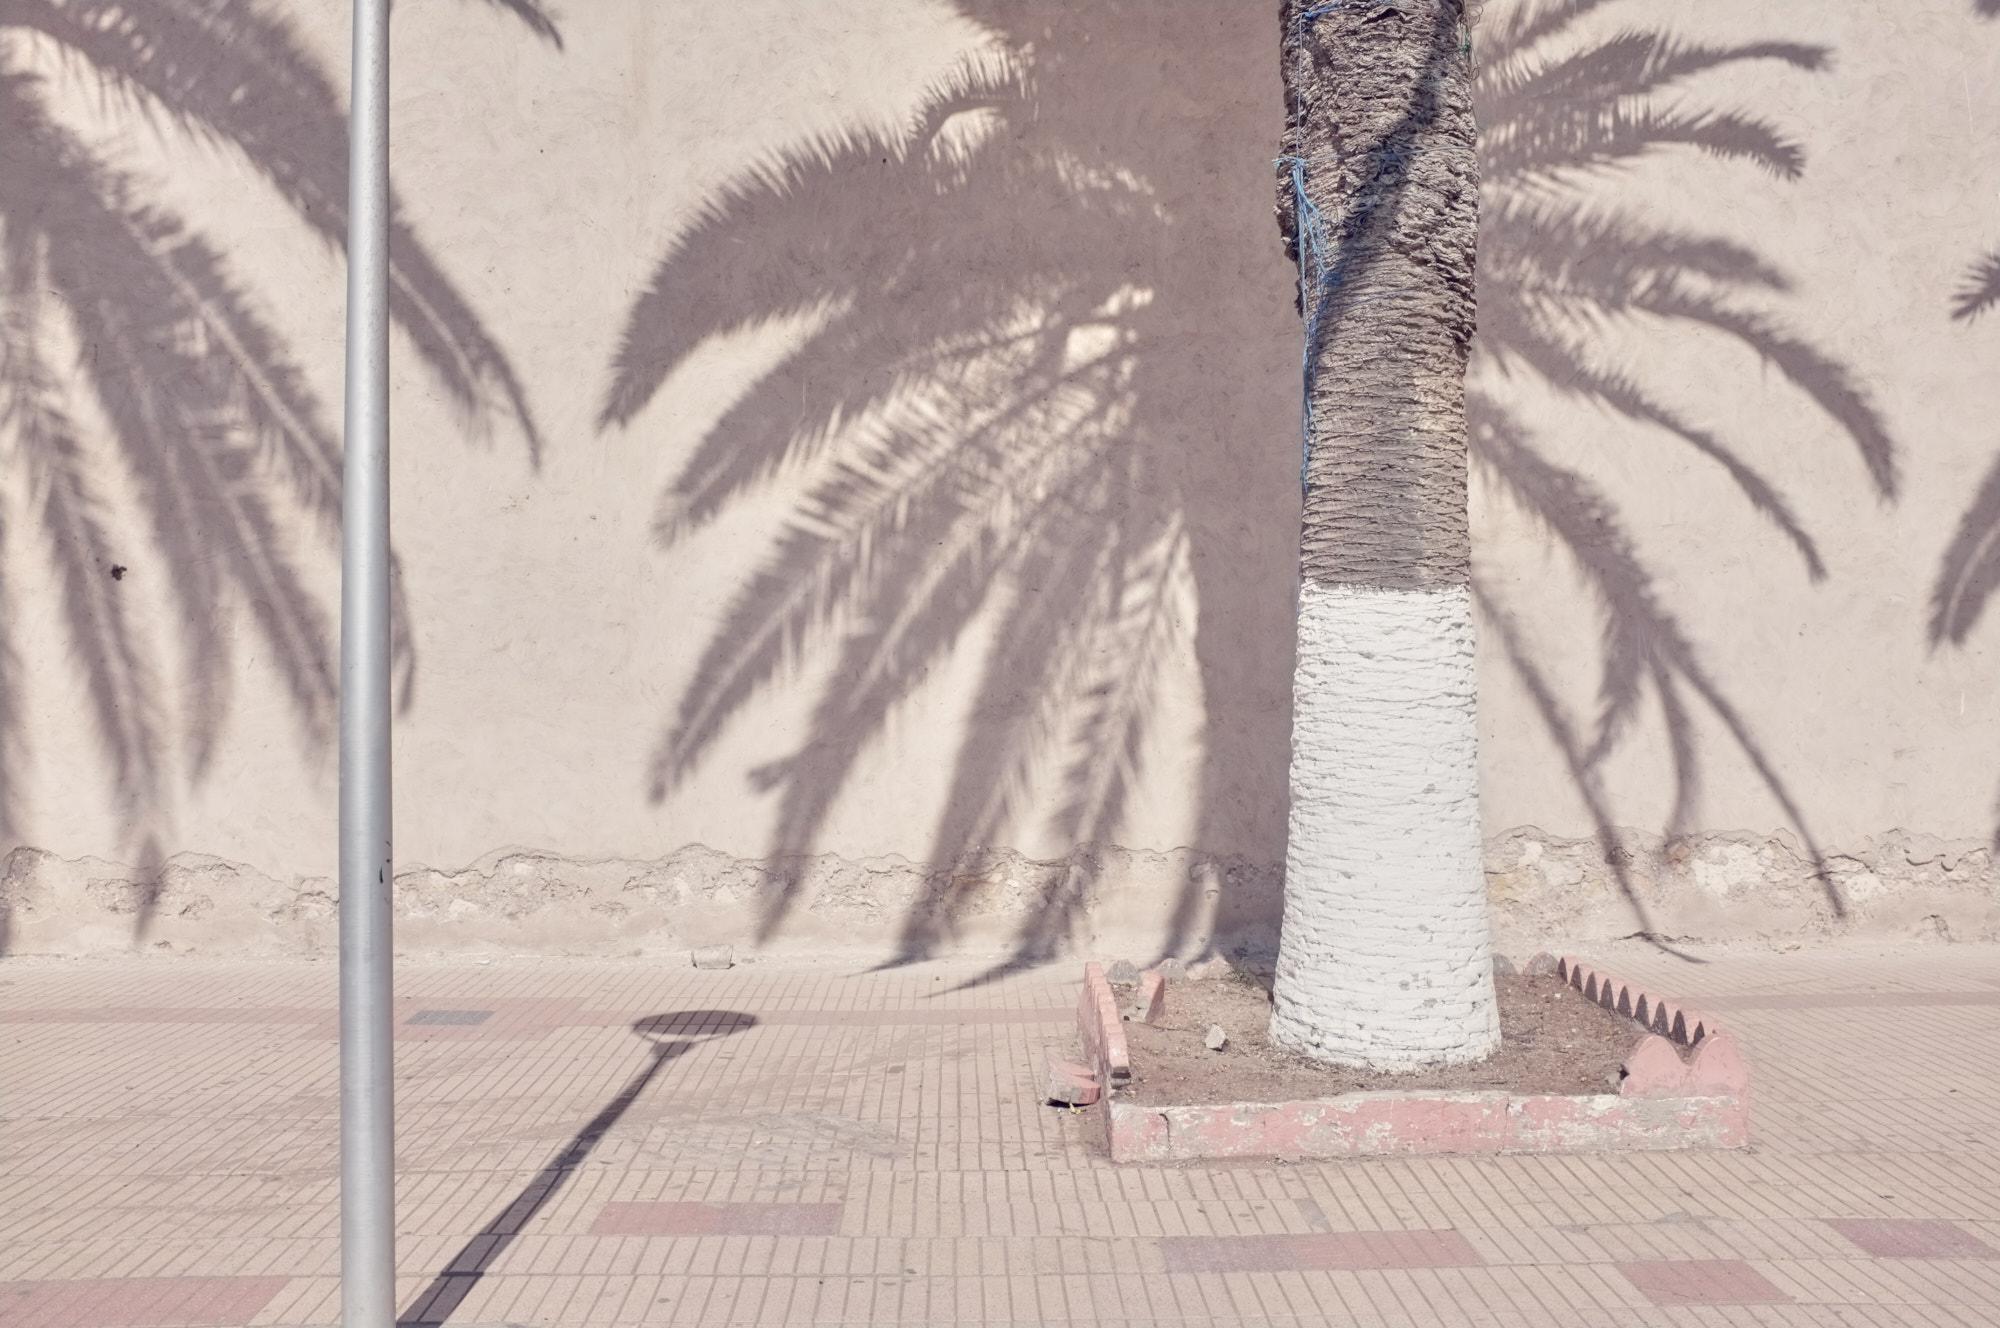 SMCLEOD_Morocco_2016_09_17